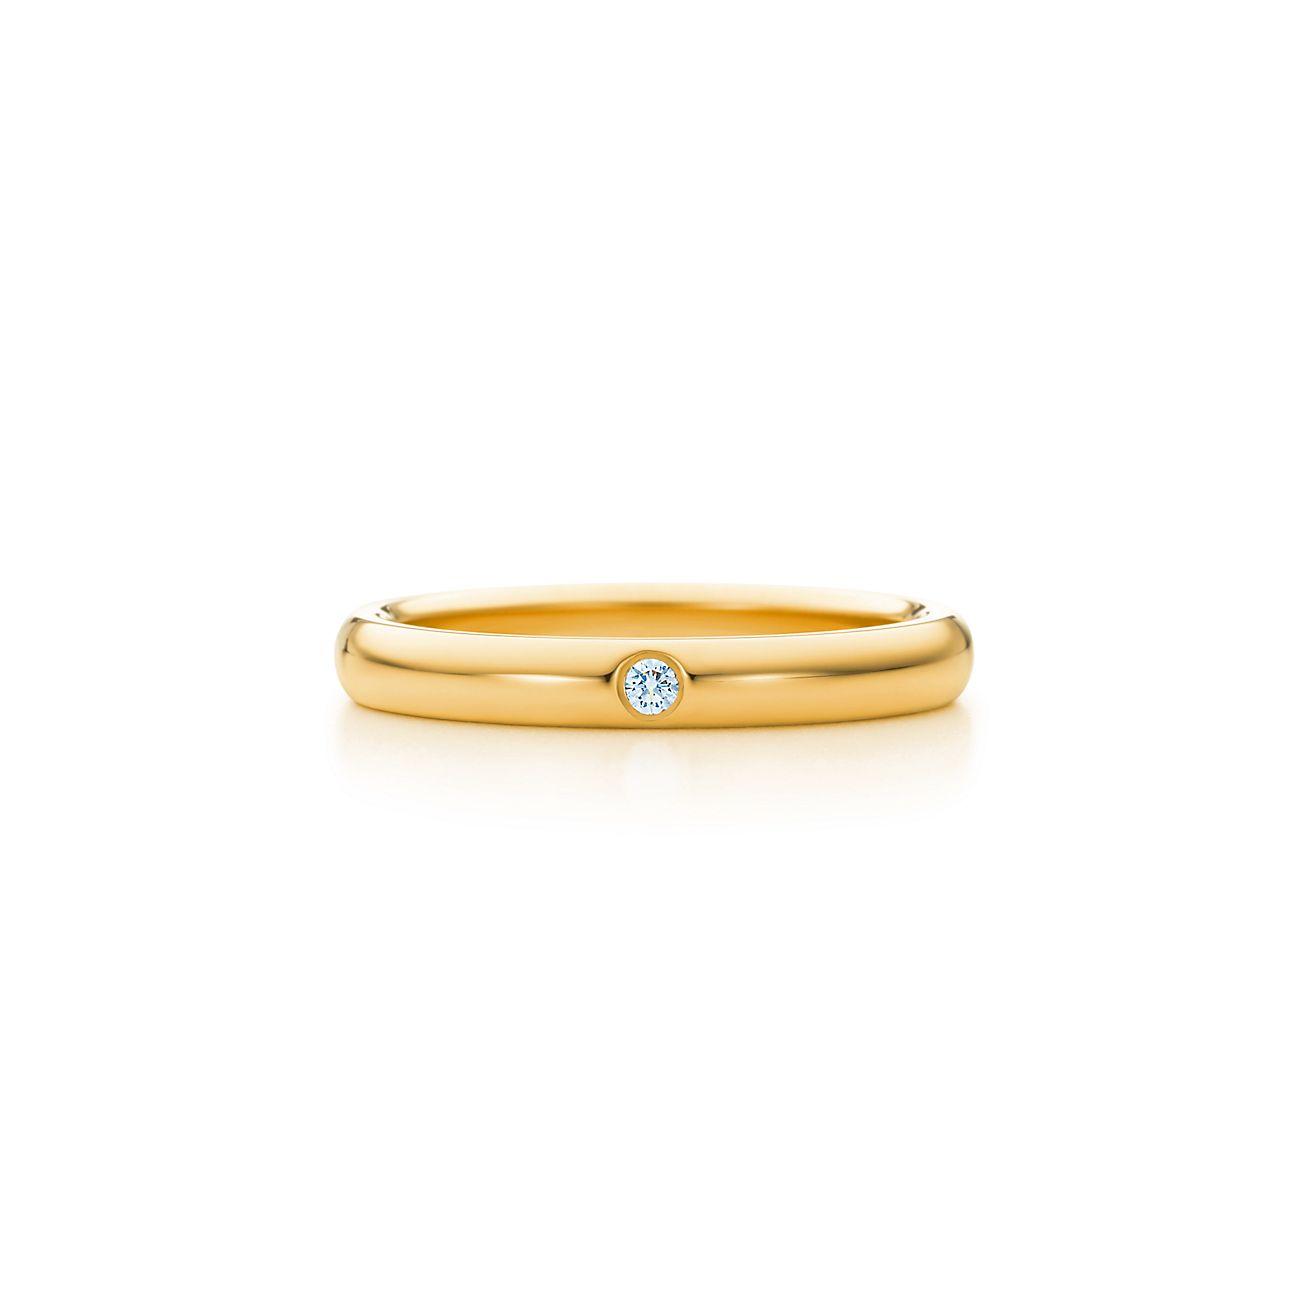 Elsa Peretti wedding band ring with diamonds in 18k gold - Size 4 1/2 Tiffany & Co. wrYkBIjMZy